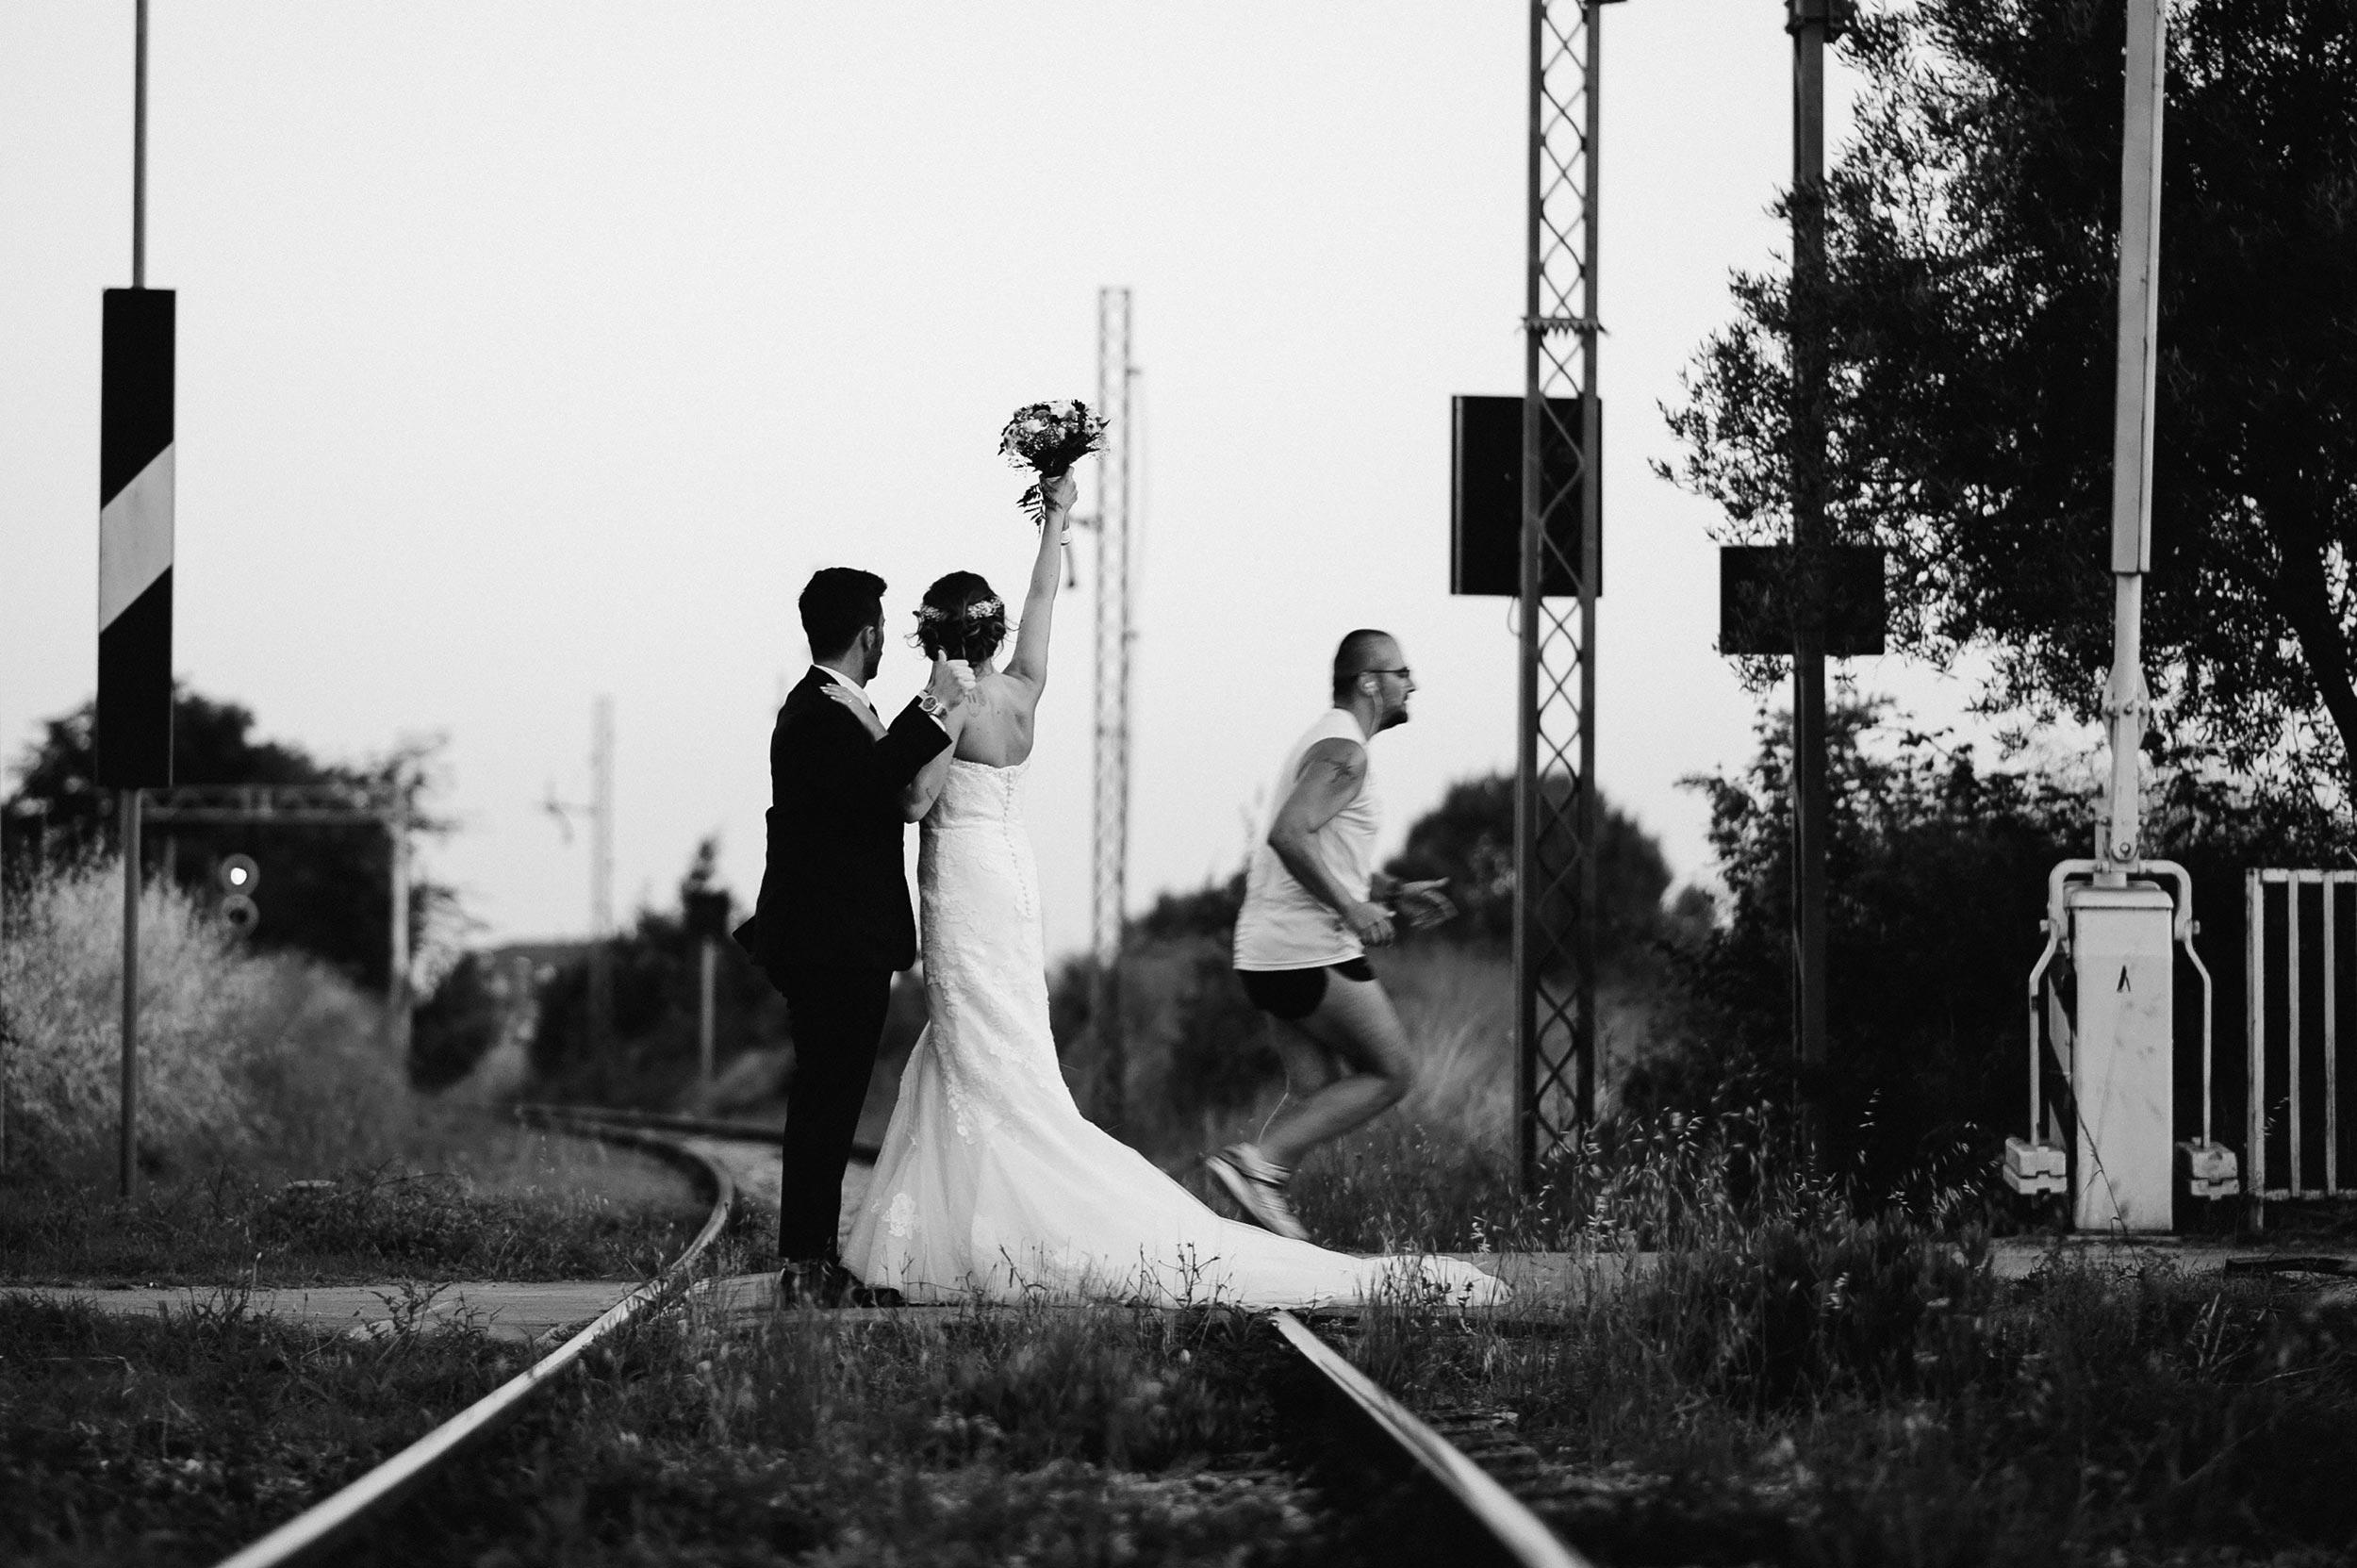 2016-Claudio-Teresa-Naples-Wedding-Photographer-Italy-Alessandro-Avenali-86.jpg